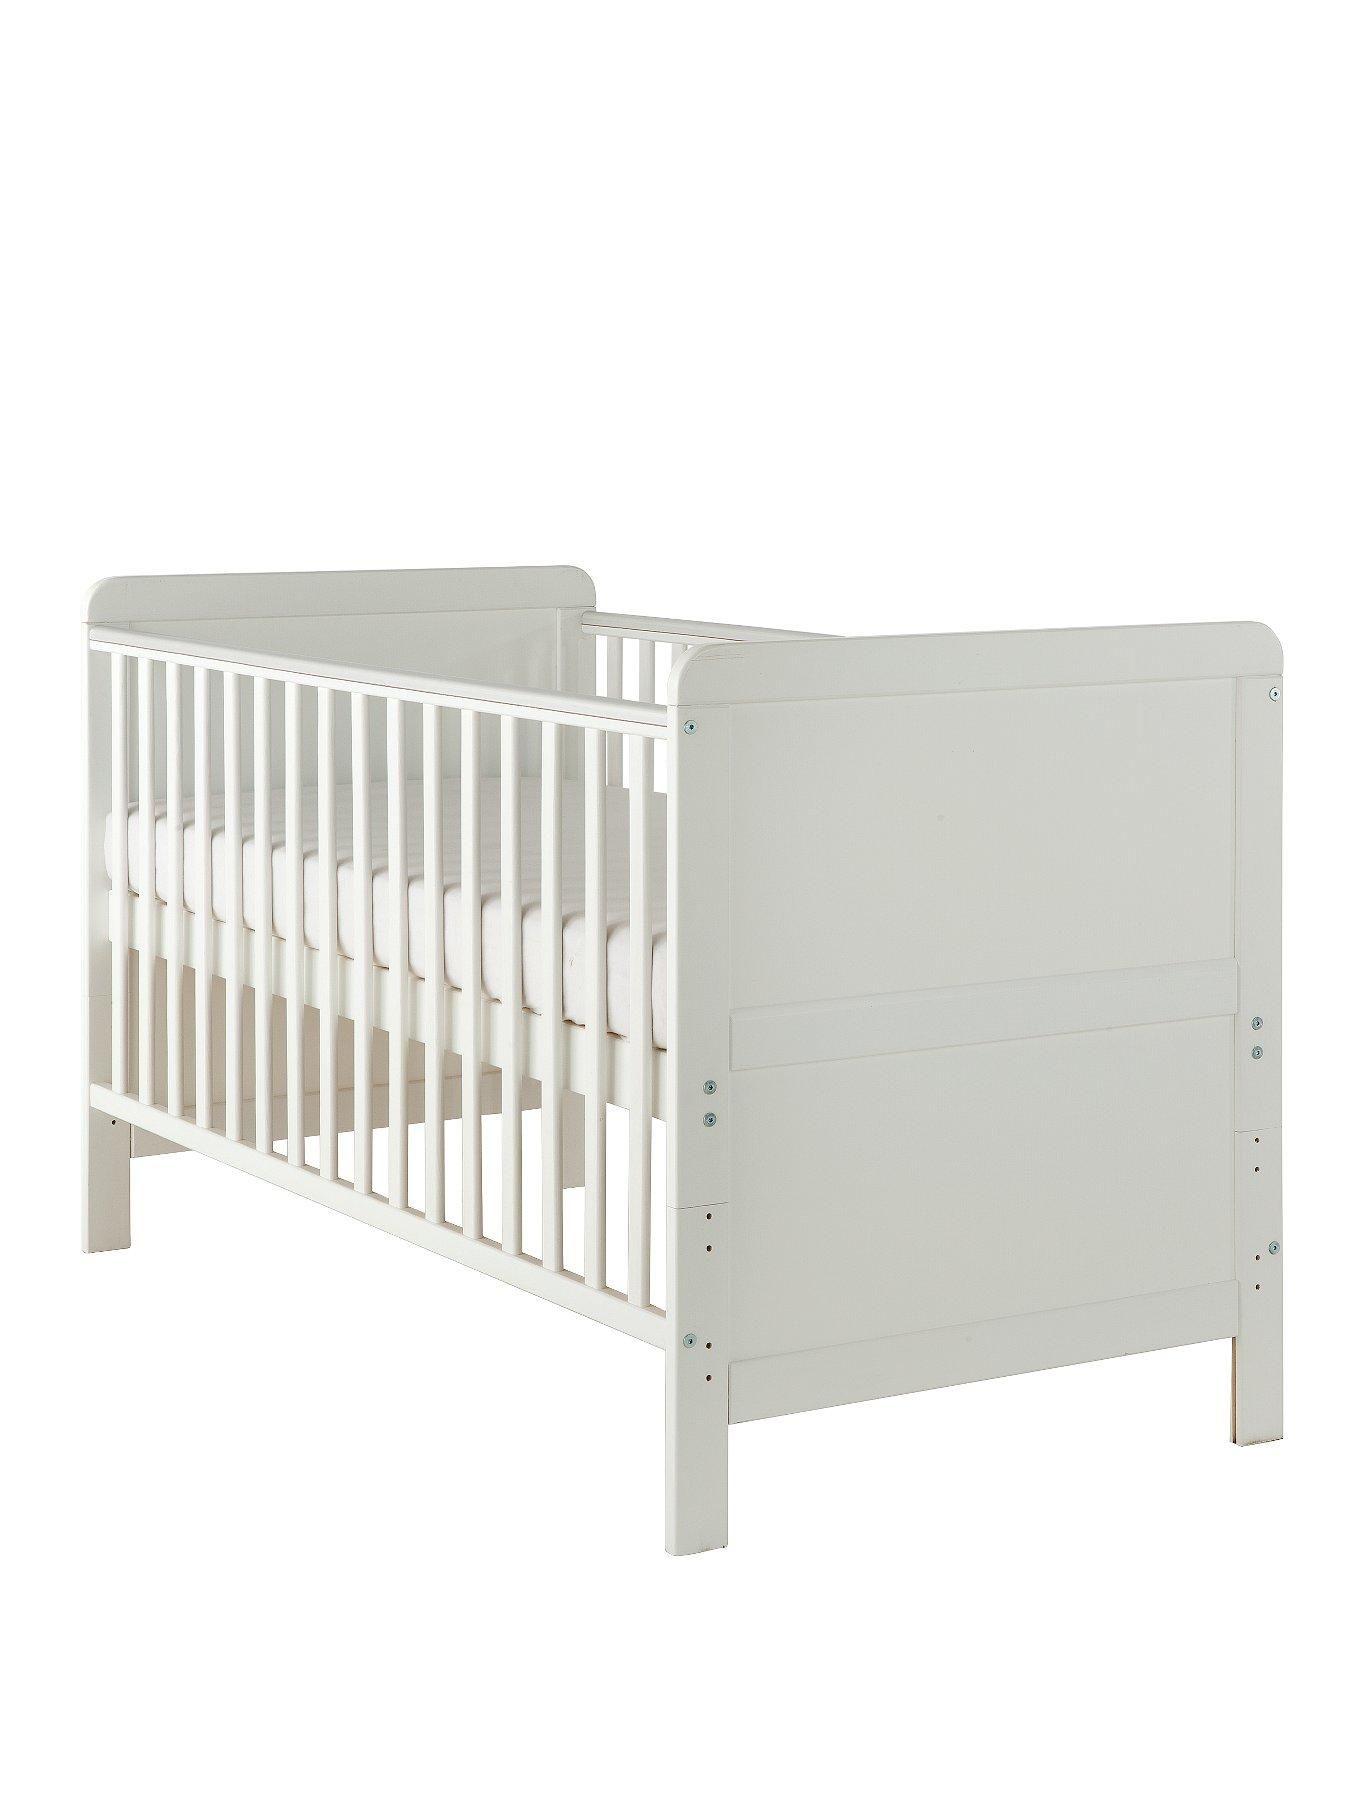 Little Acorns Classic Cot Bed Cot Bedding Bed Cot